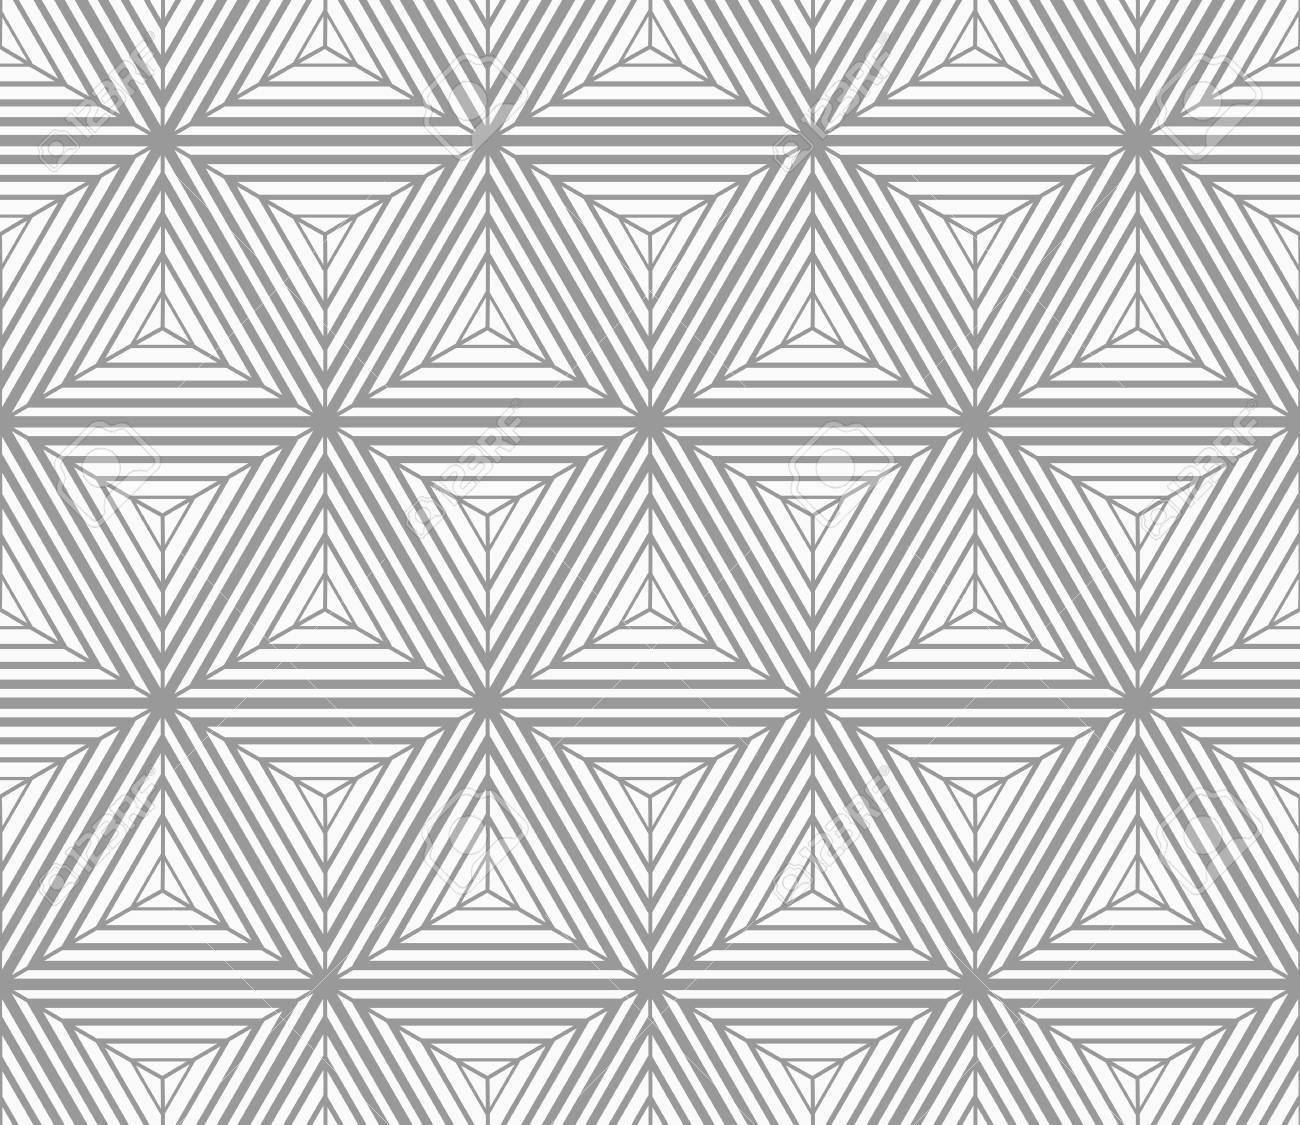 seamless geometric pattern gray abstract geometrical design flat monochrome designmonochrome gradually striped